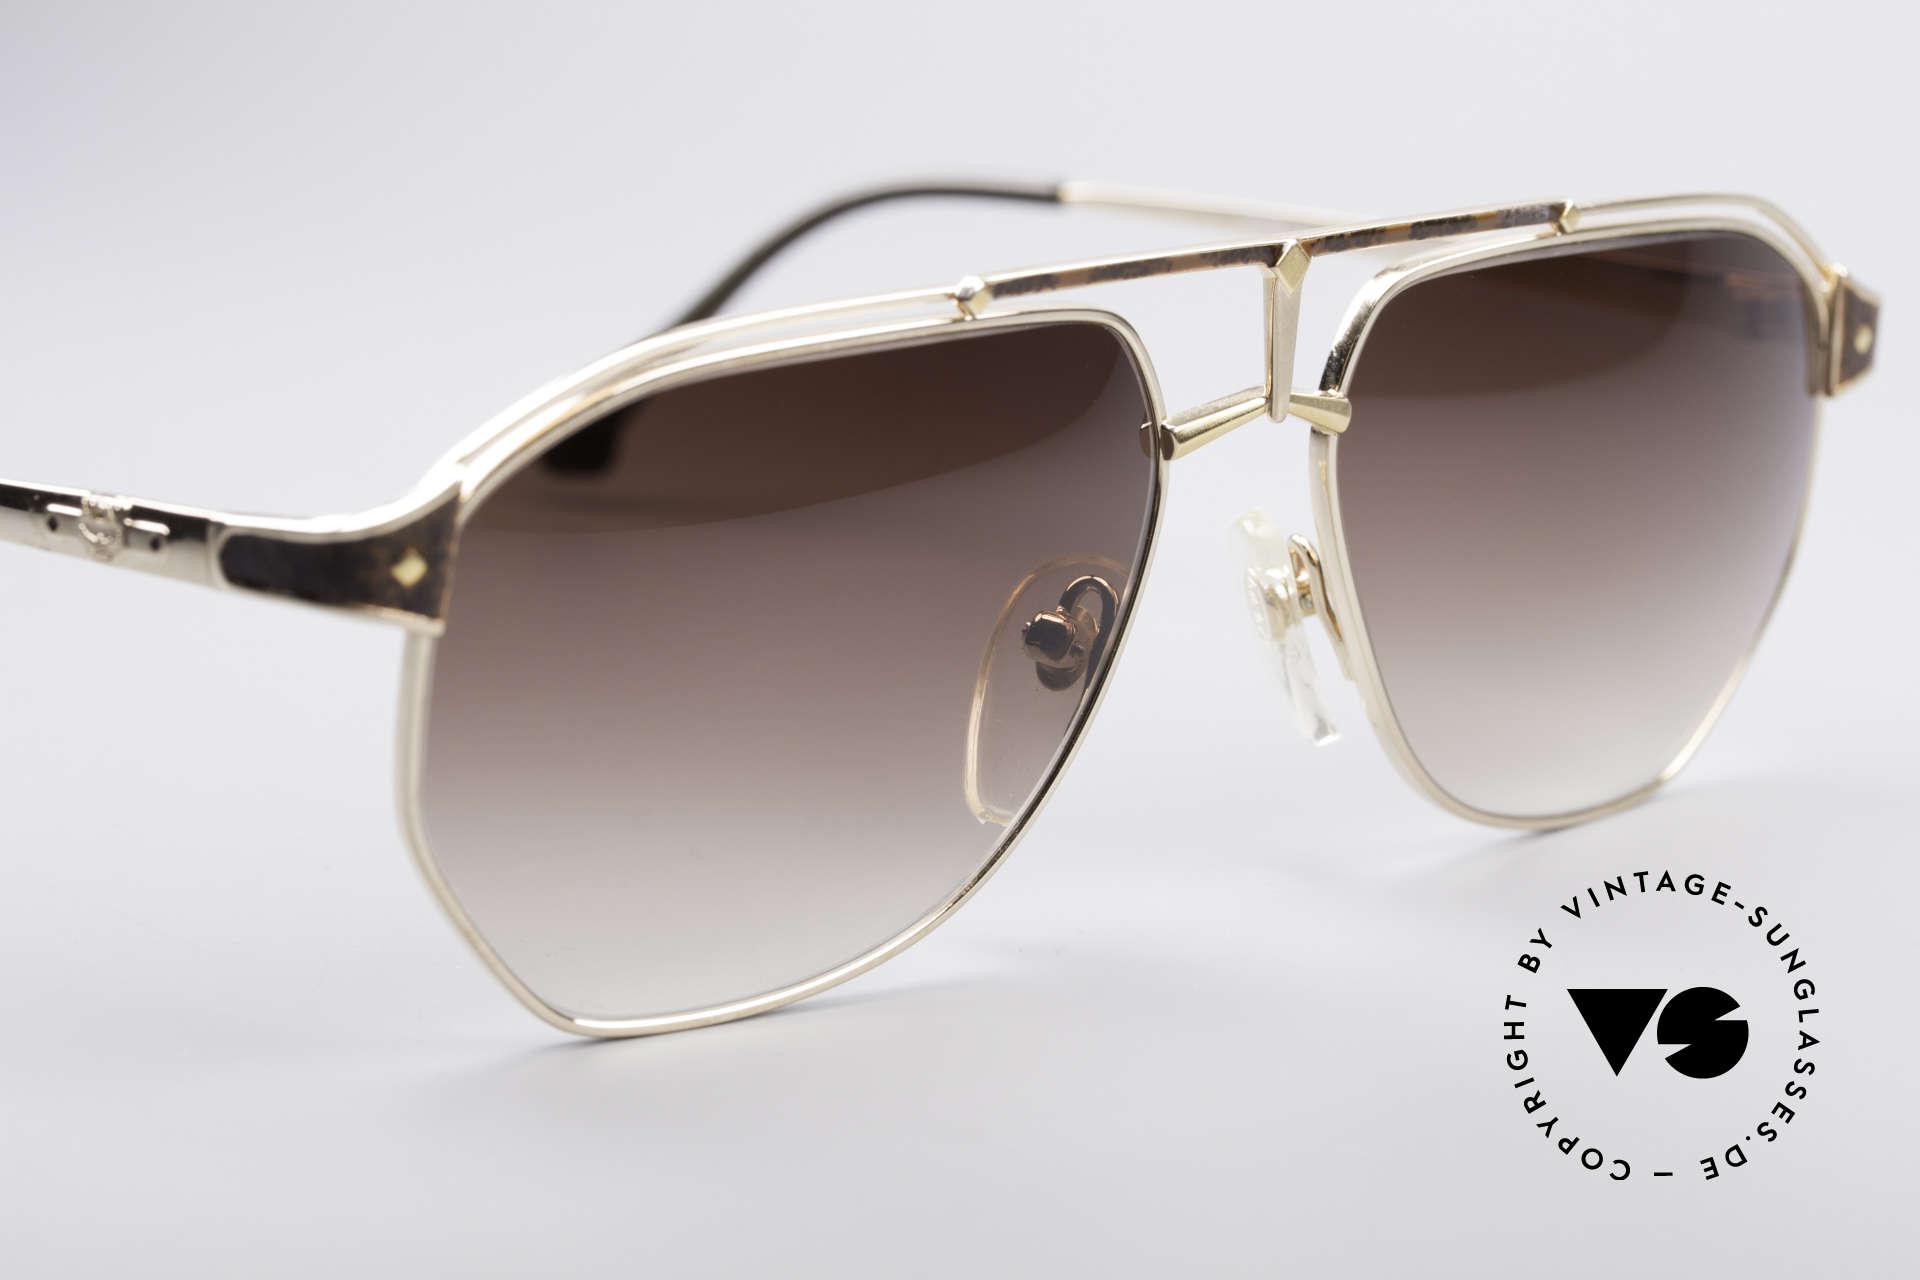 MCM München 6 XL 90's Luxury Shades, luxury Michael Cromer (MC), Munich (M) sunglasses, Made for Men